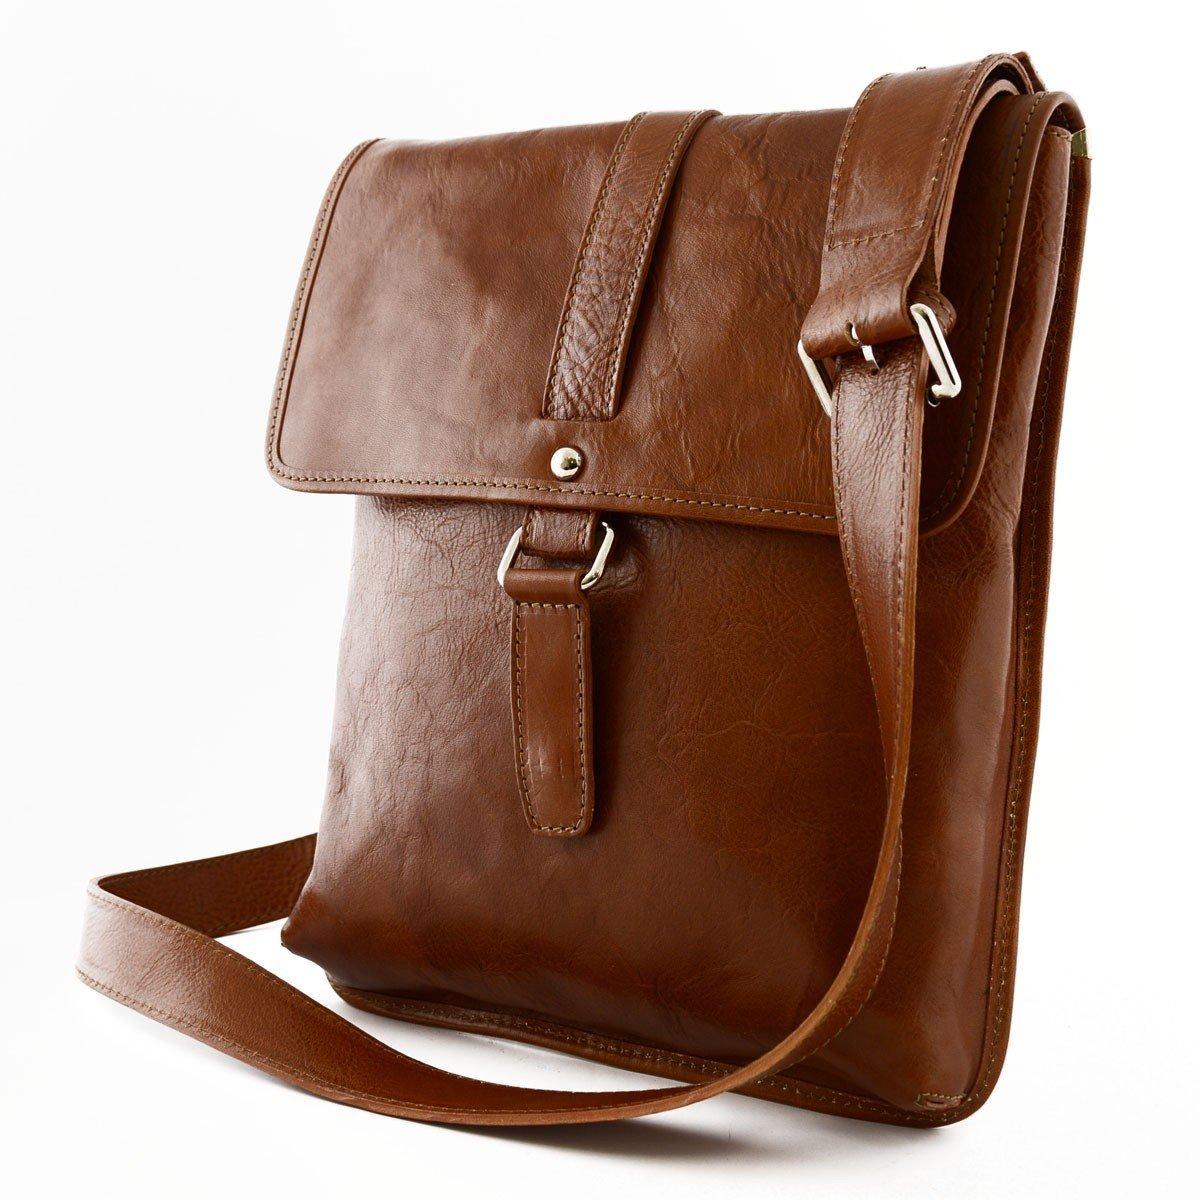 Magnetic Closure Color Cognac Genuine Leather Man Bag